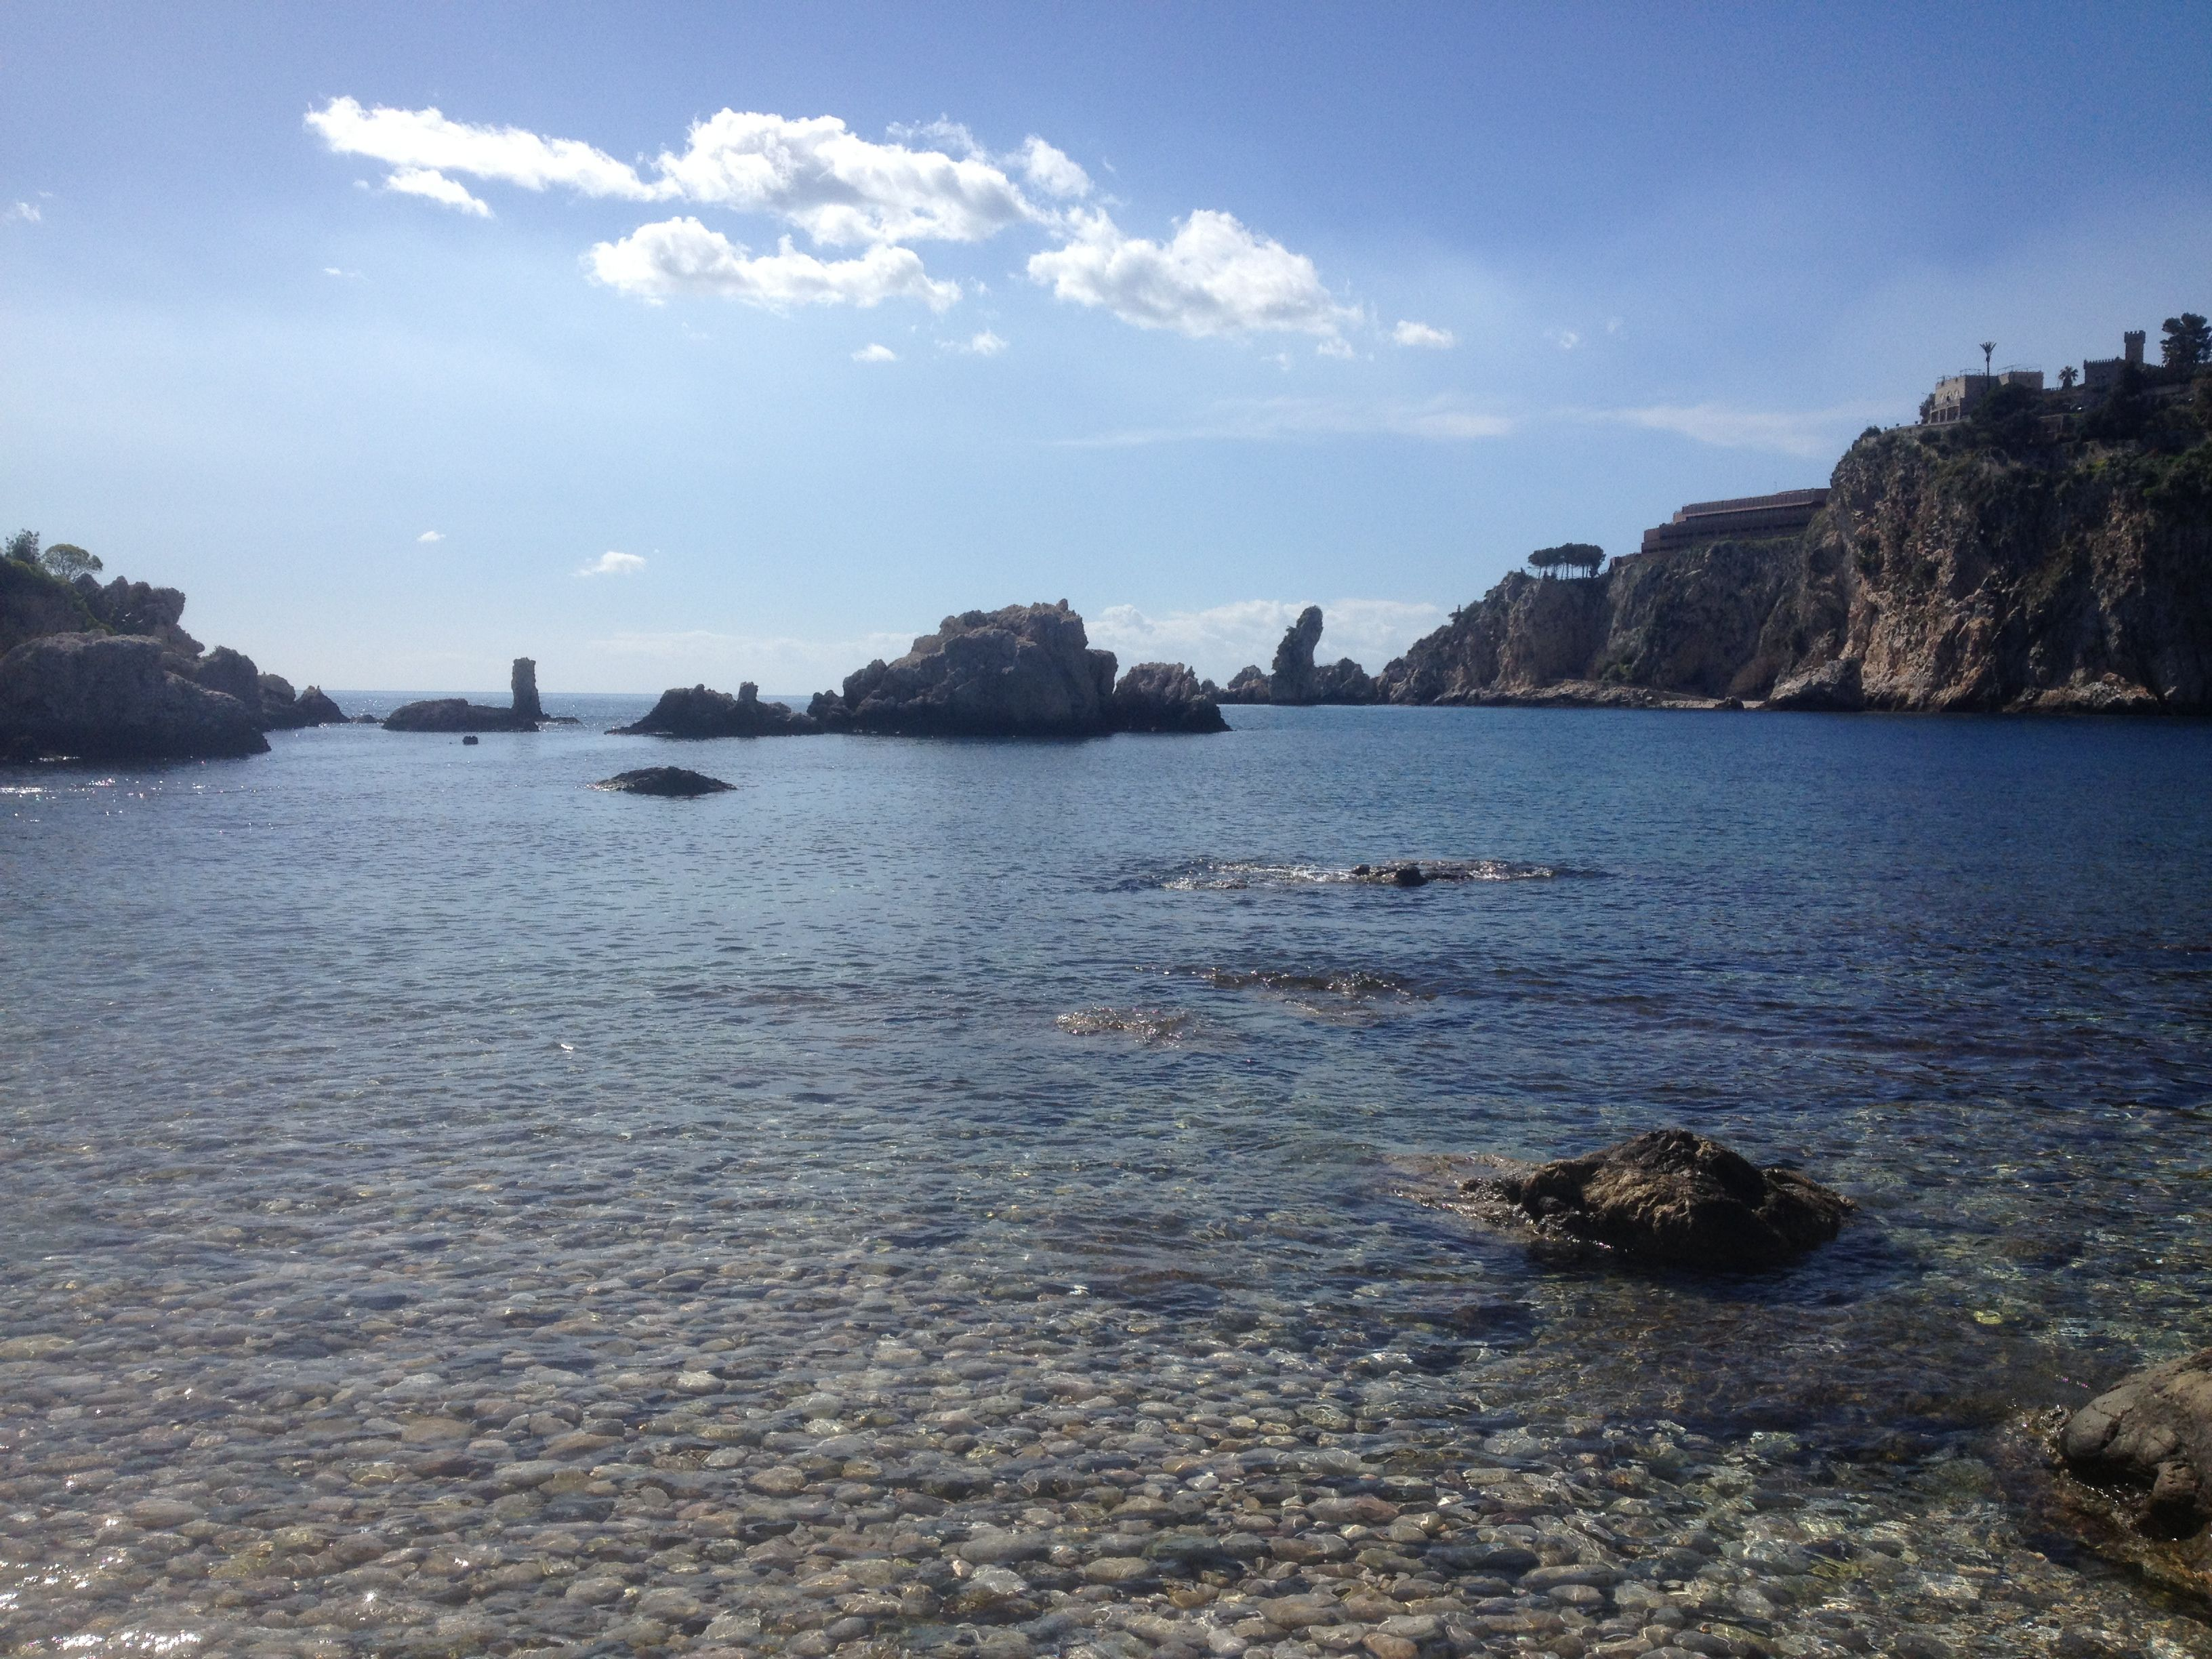 Island off the coast of Sicily